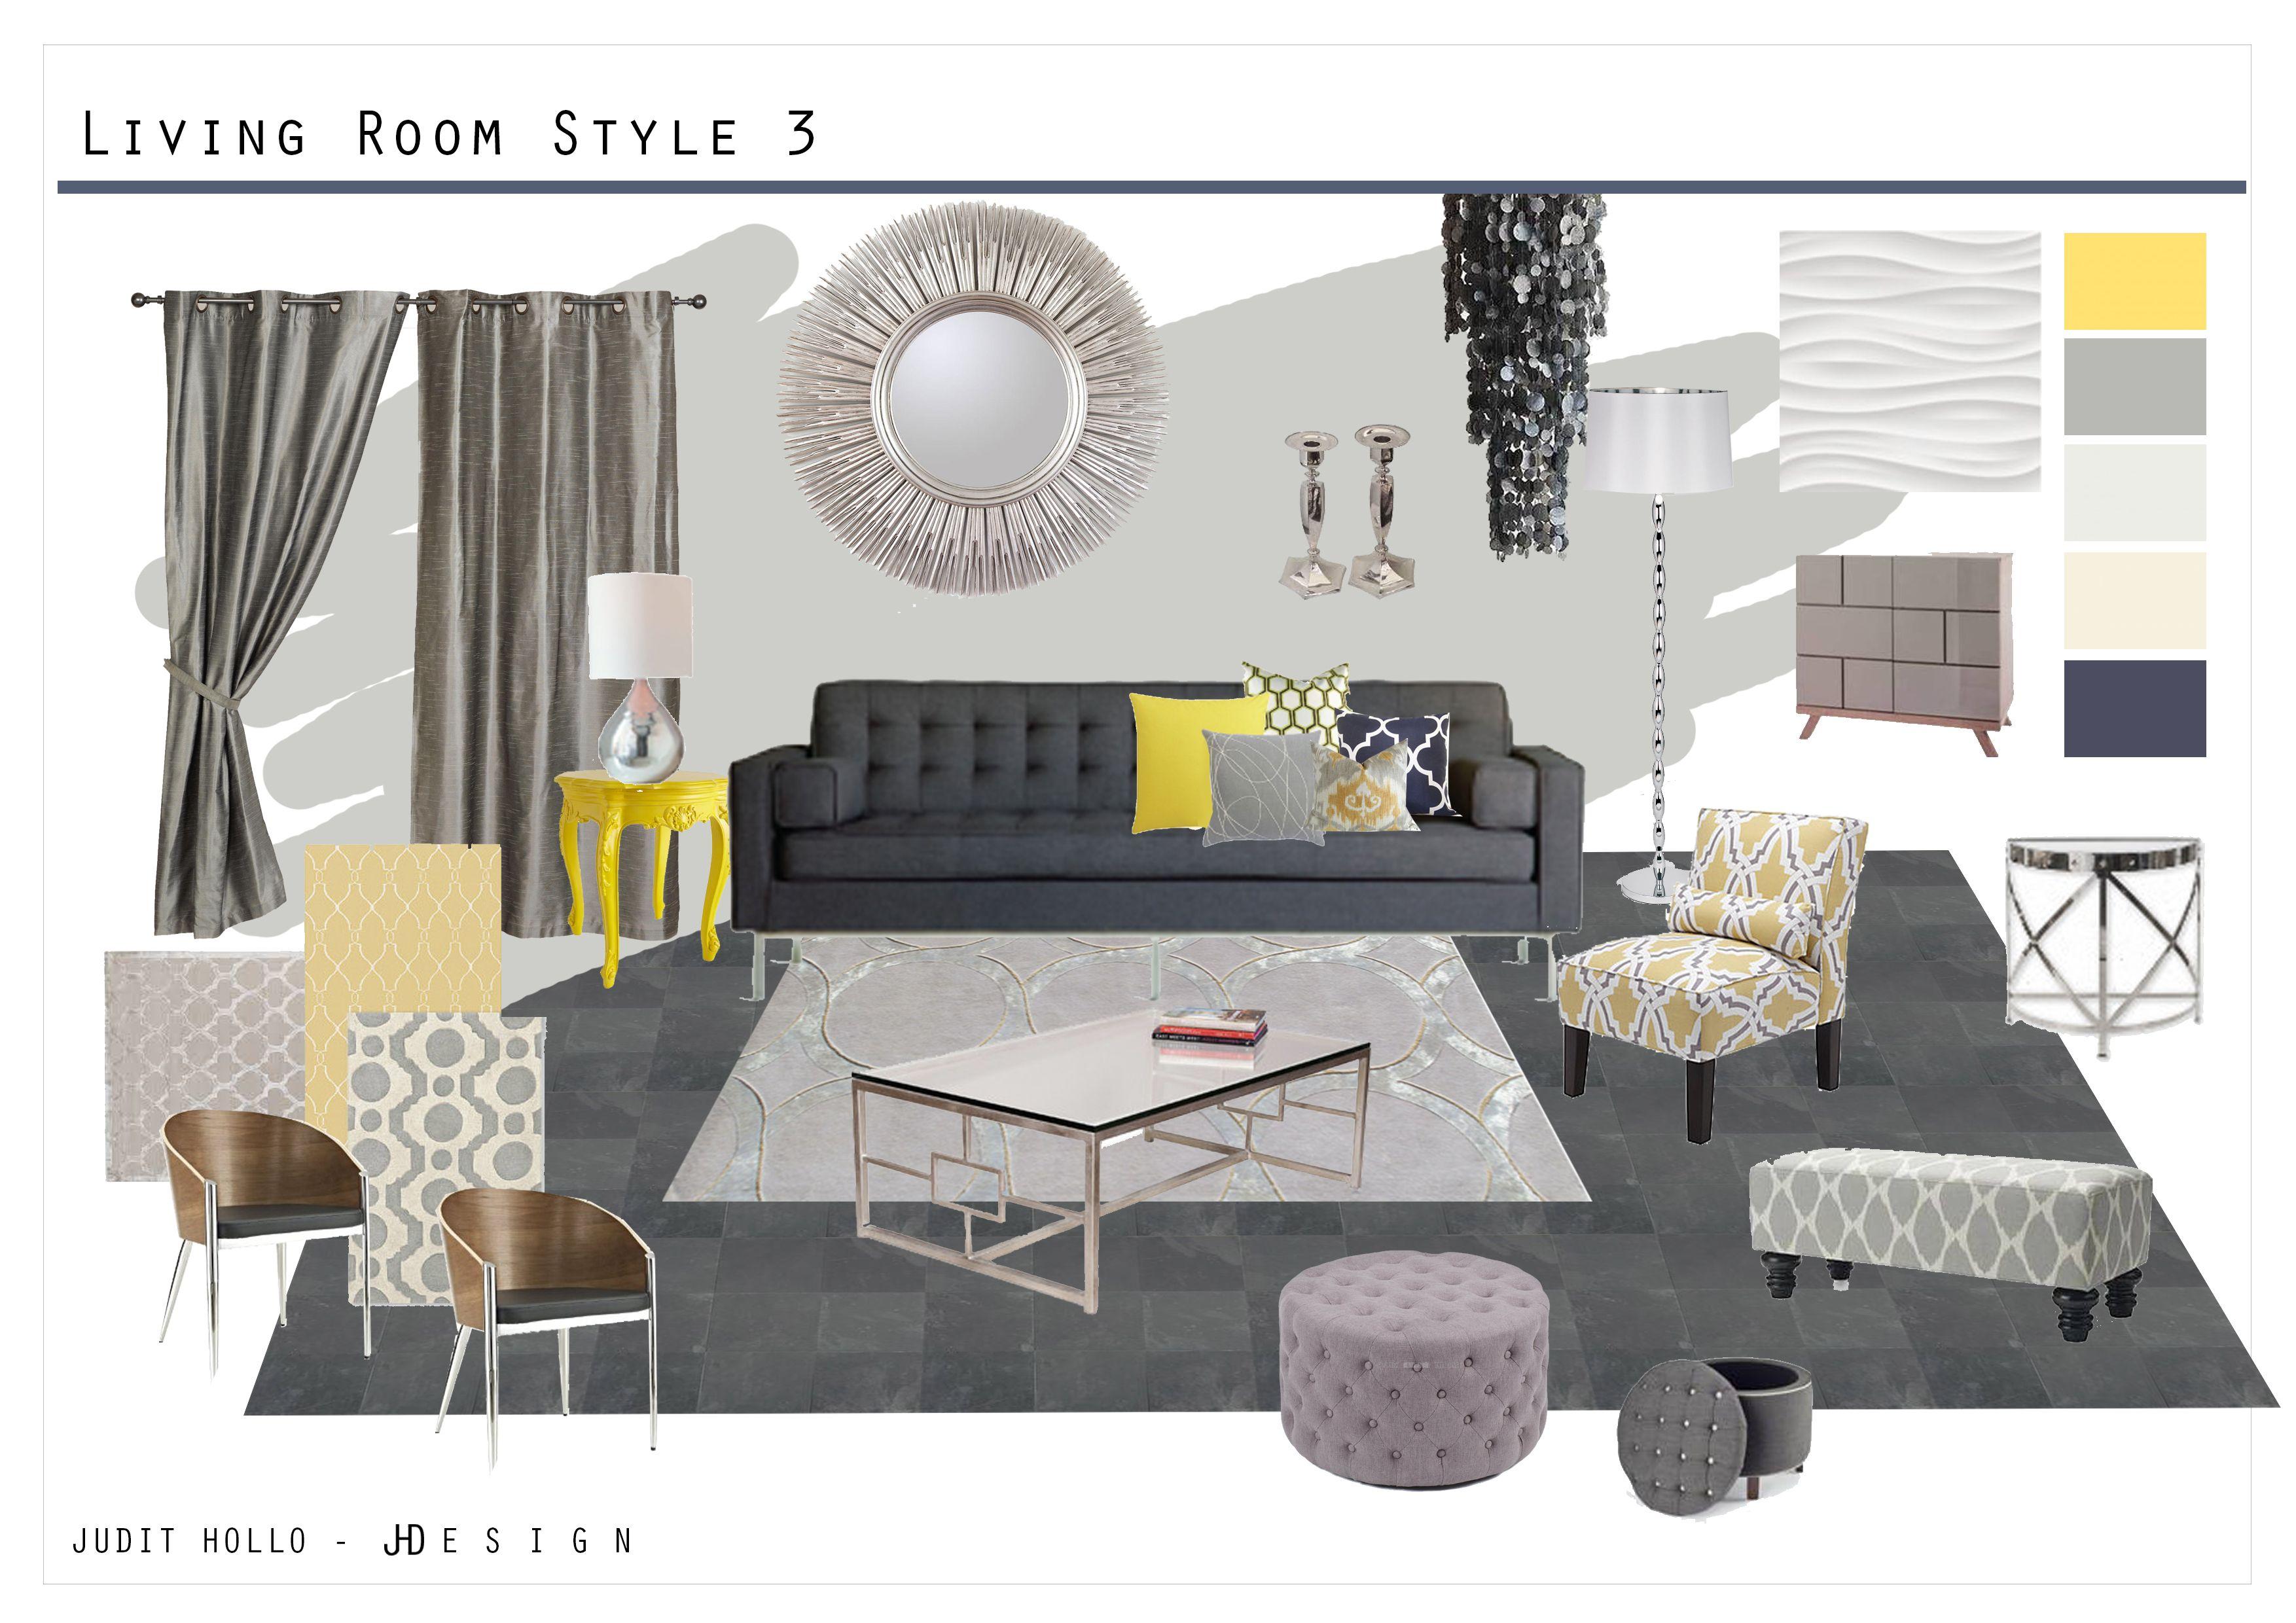 Living Room And Master Bedroom Mood Board Interior Design Boards